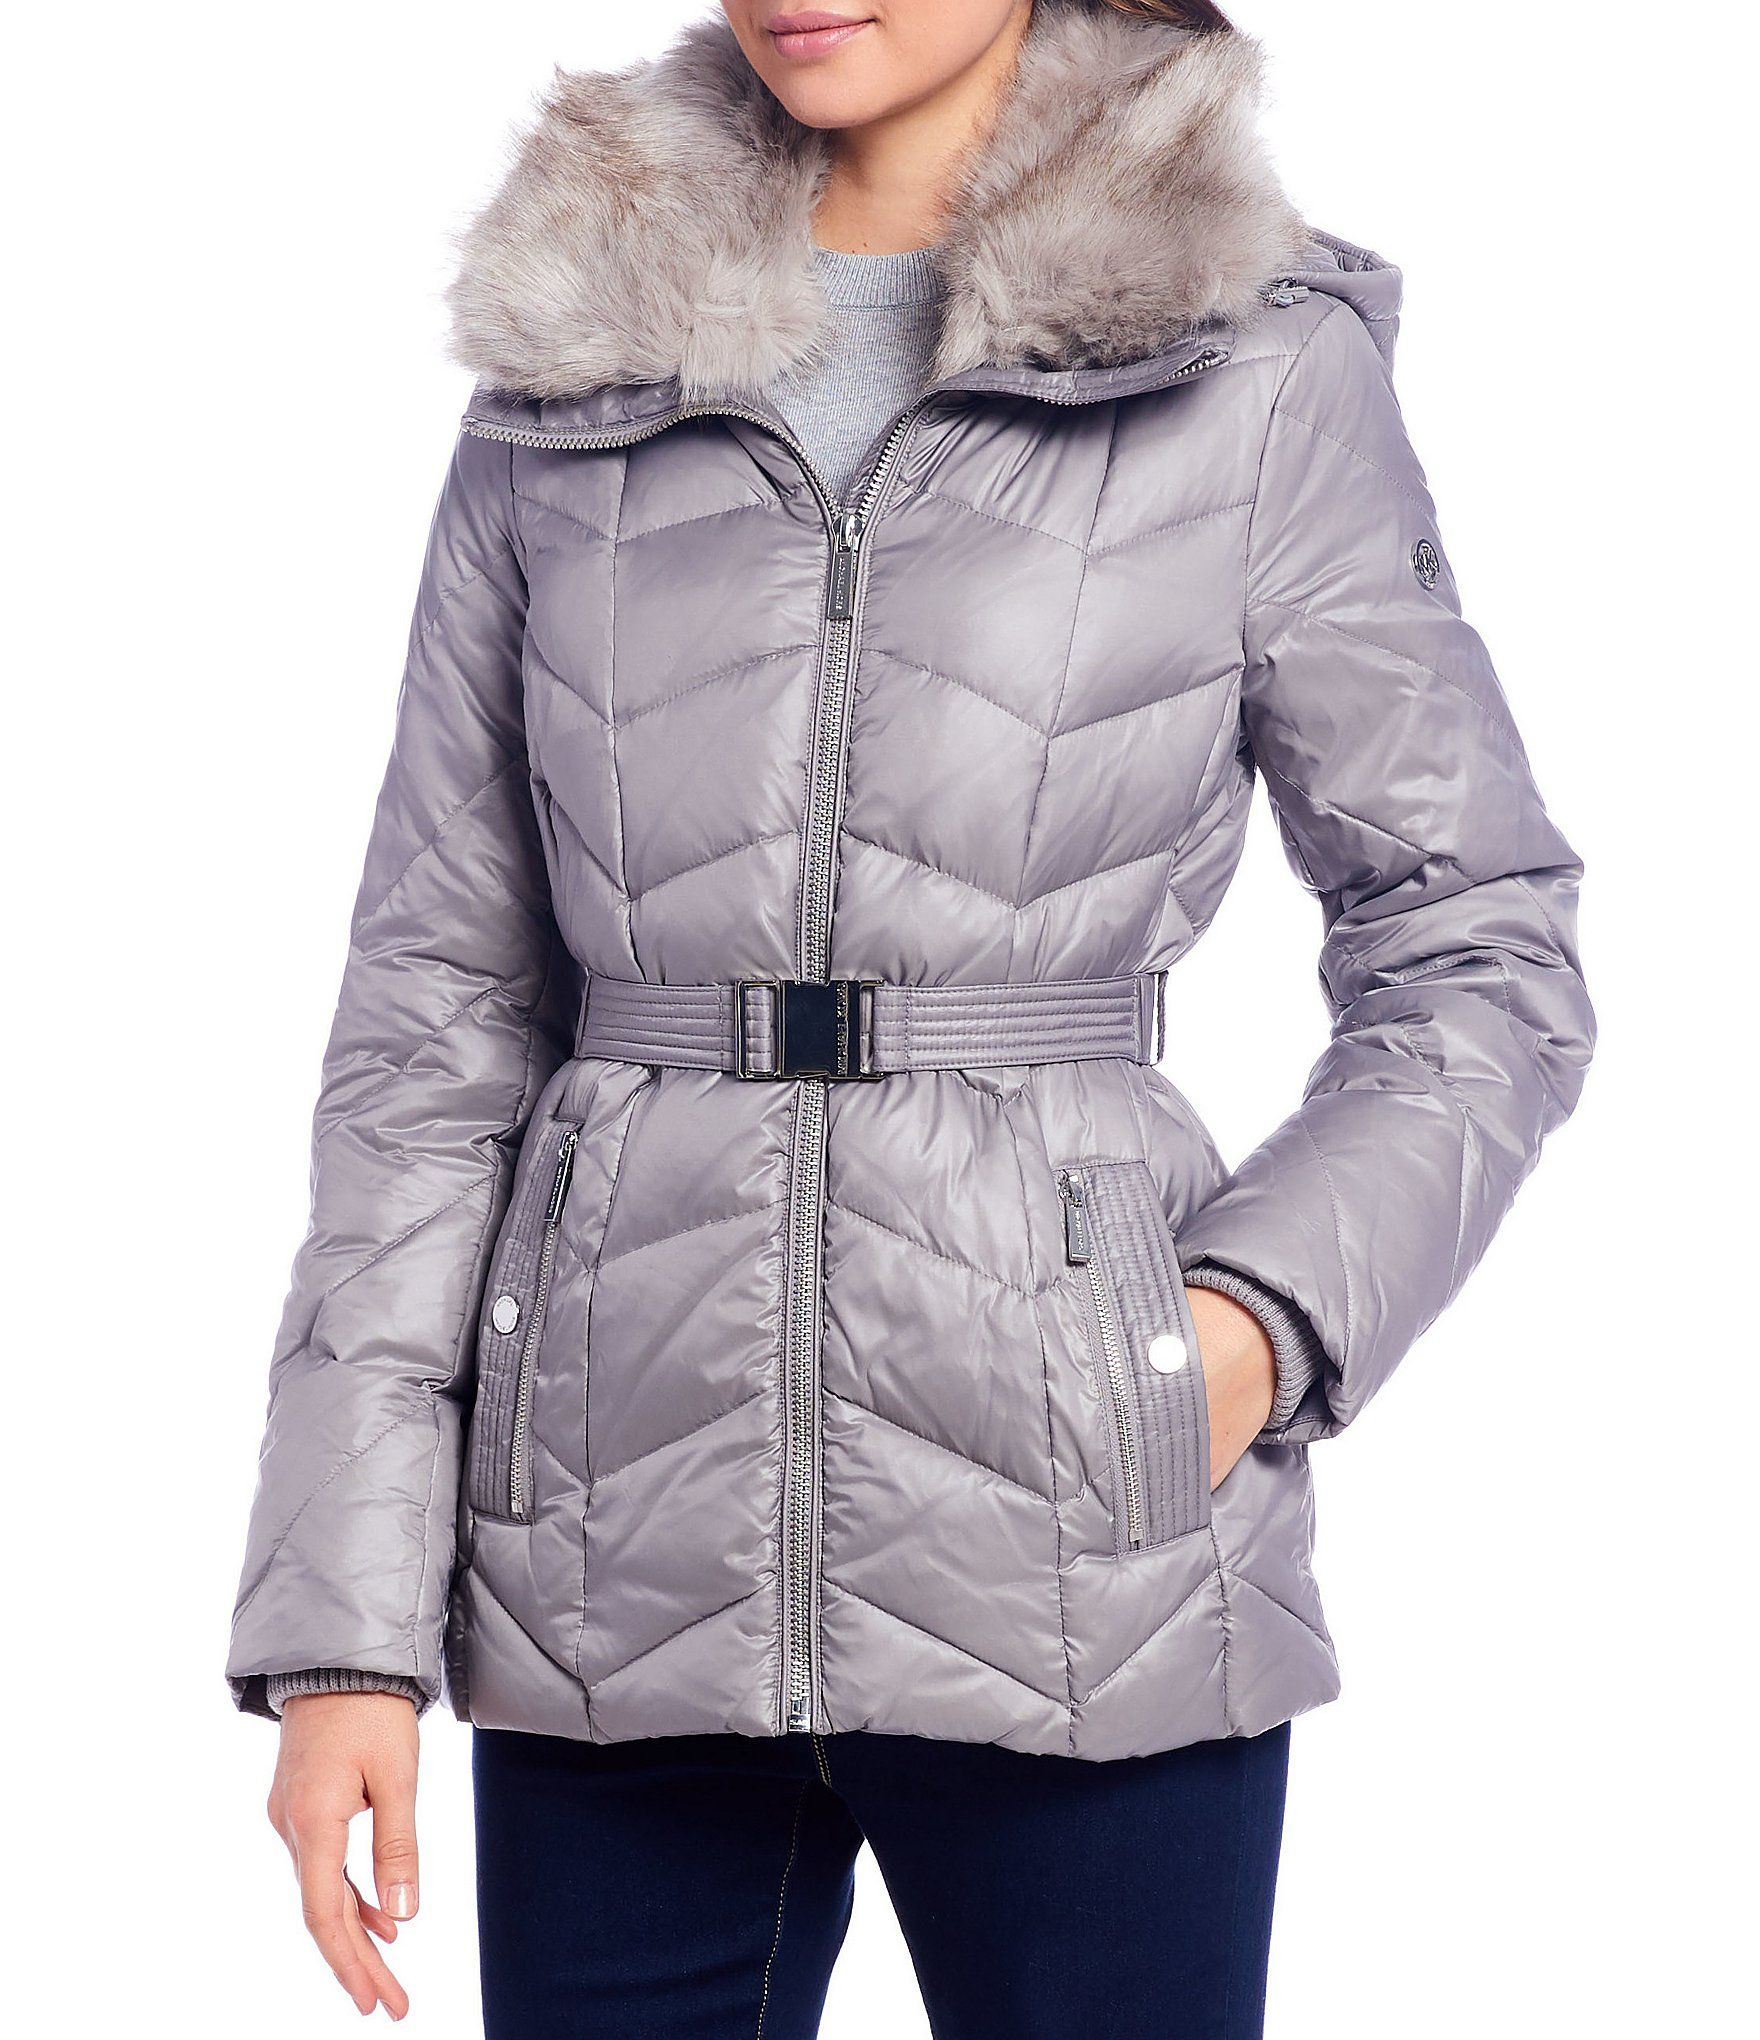 Michael Michael Kors Removable Faux Fur Collar Belted Down Puffer Coat Dillards Coats Jackets Women Coats For Women Down Puffer Coat [ 2040 x 1760 Pixel ]